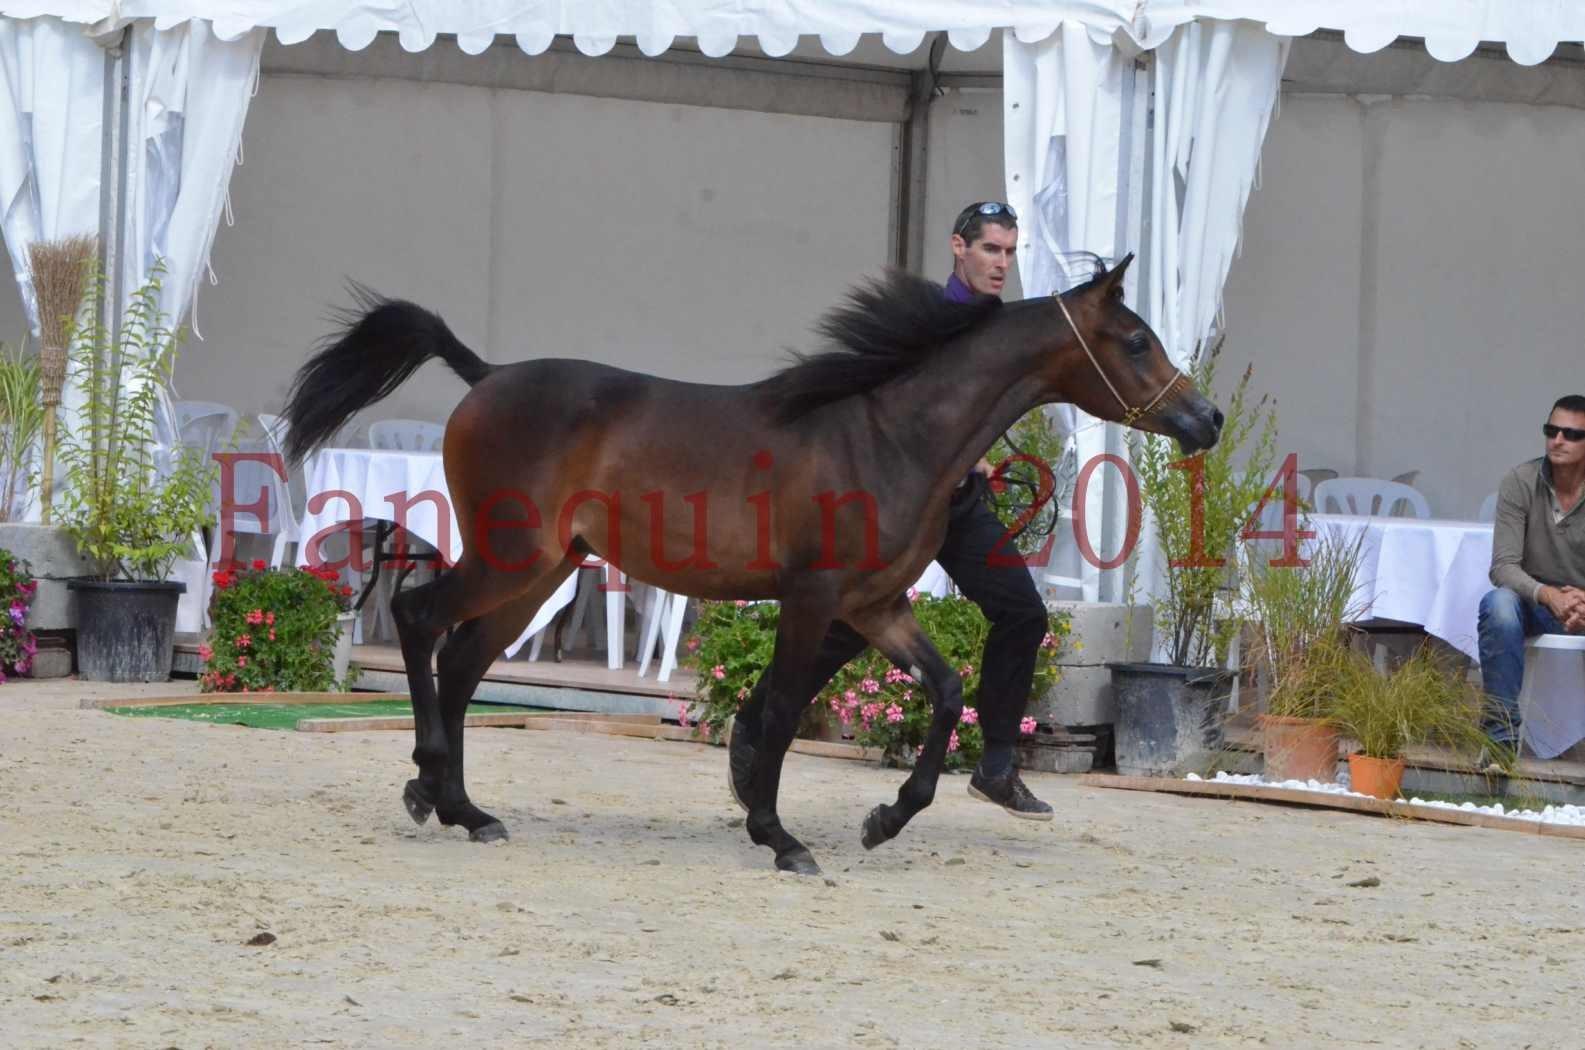 Championnat de FRANCE 2014 - Amateurs - SH FARAJAA - 22